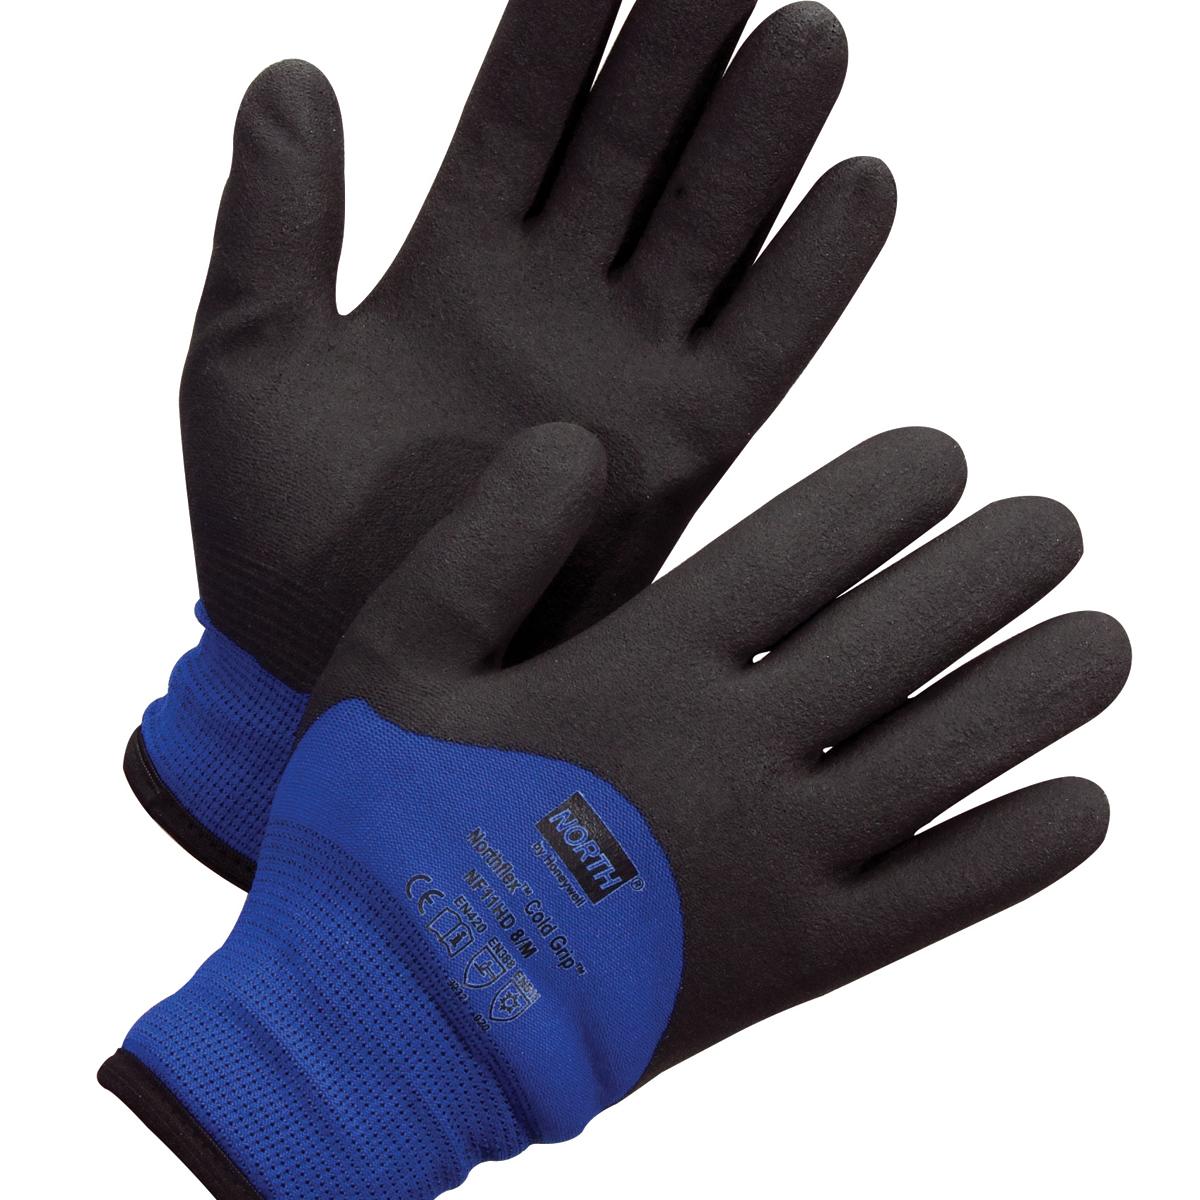 11/Handschuhe Perfekte Passform Honeywell Safety 2012950-11 Honeywell 2012950 Tuffshield Evolution Medium